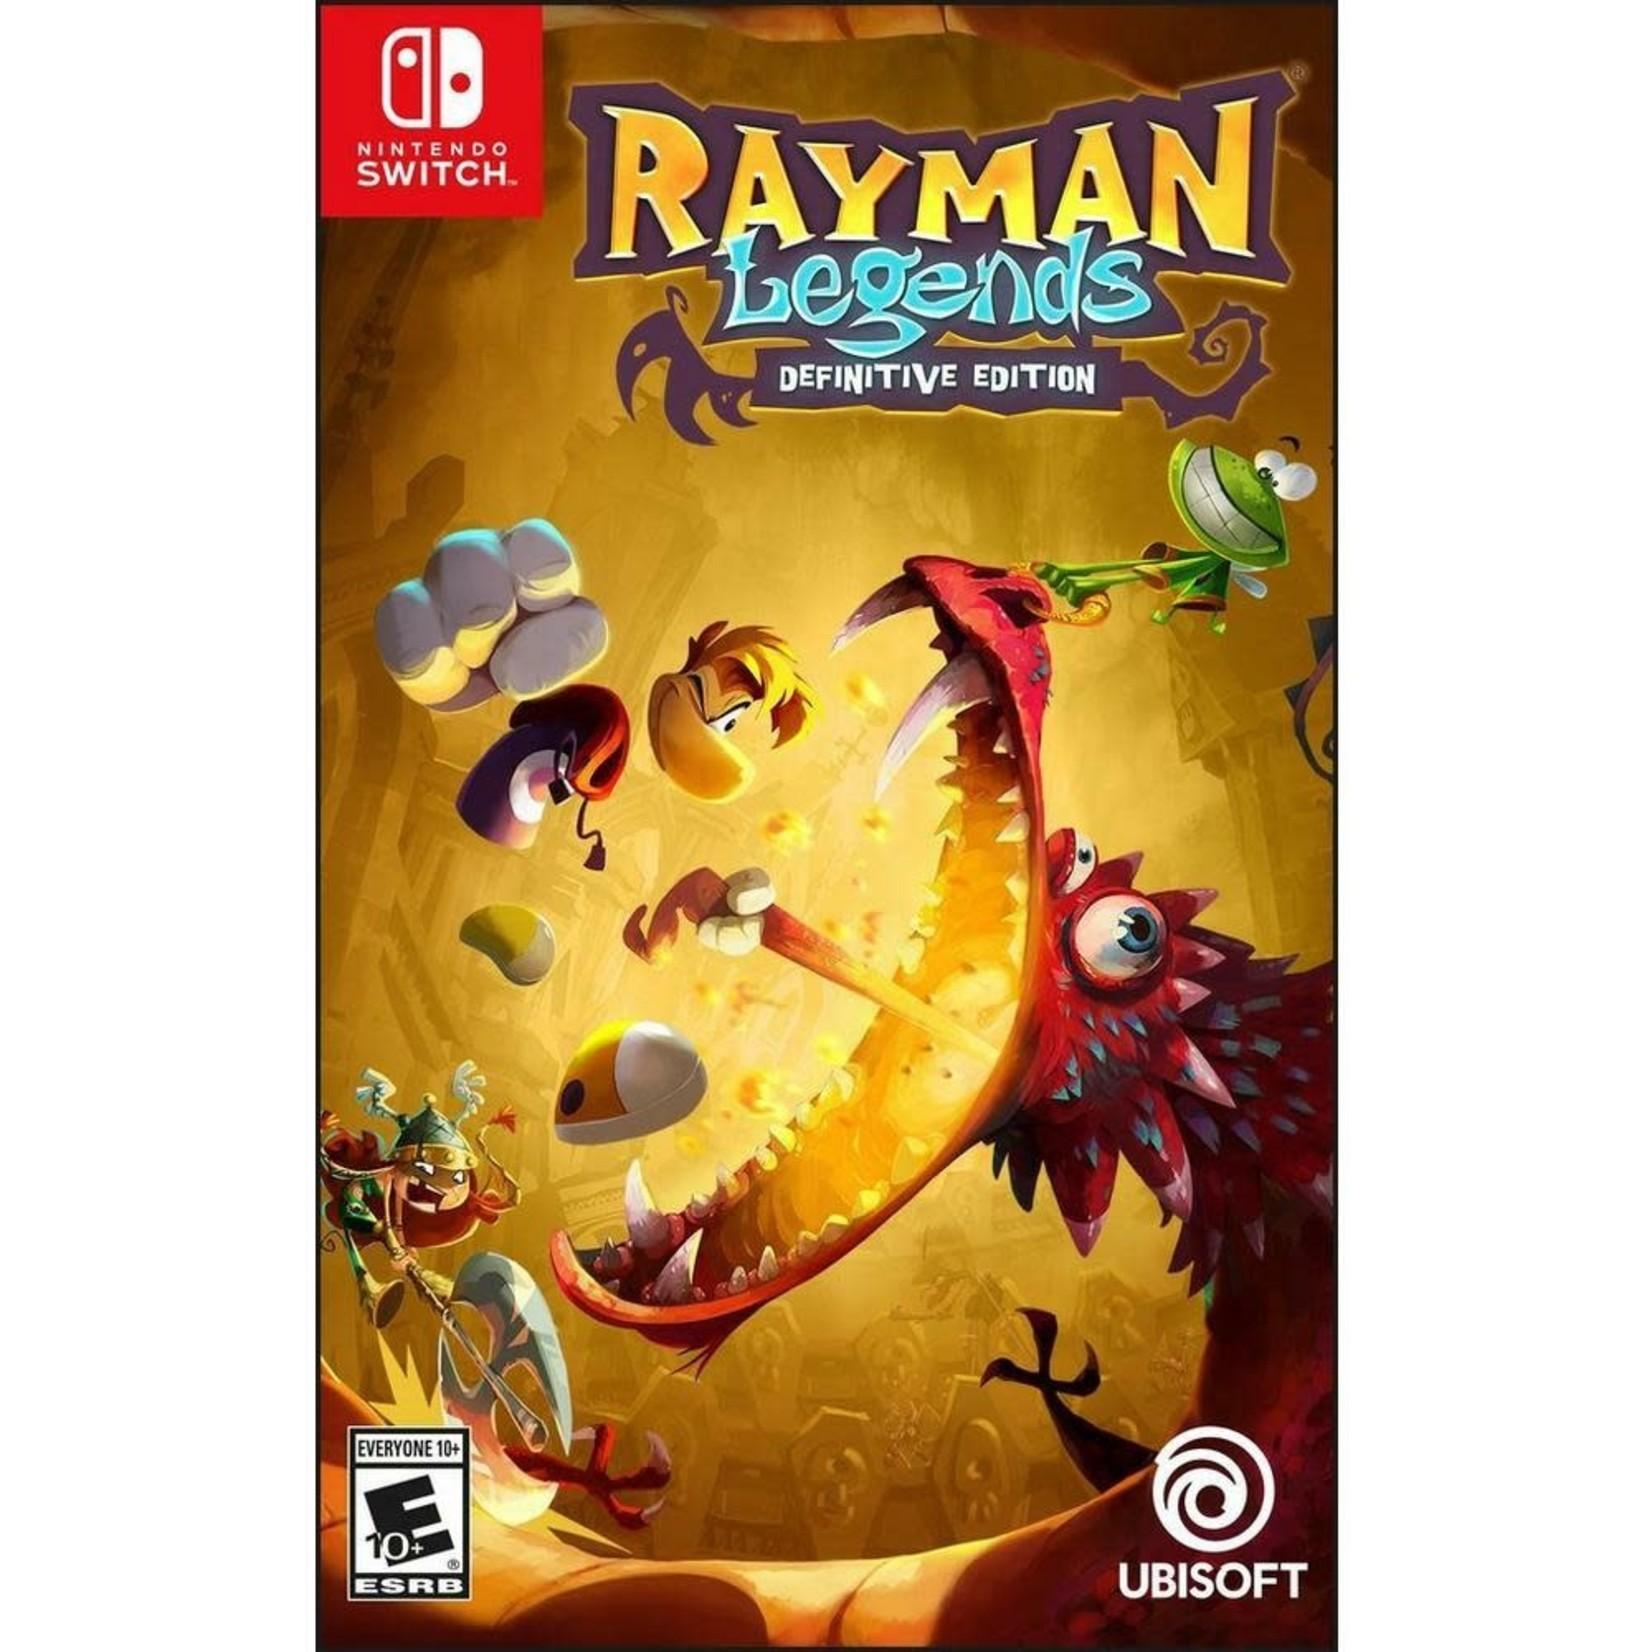 SWITCHU-Rayman Legends Definitive Edition